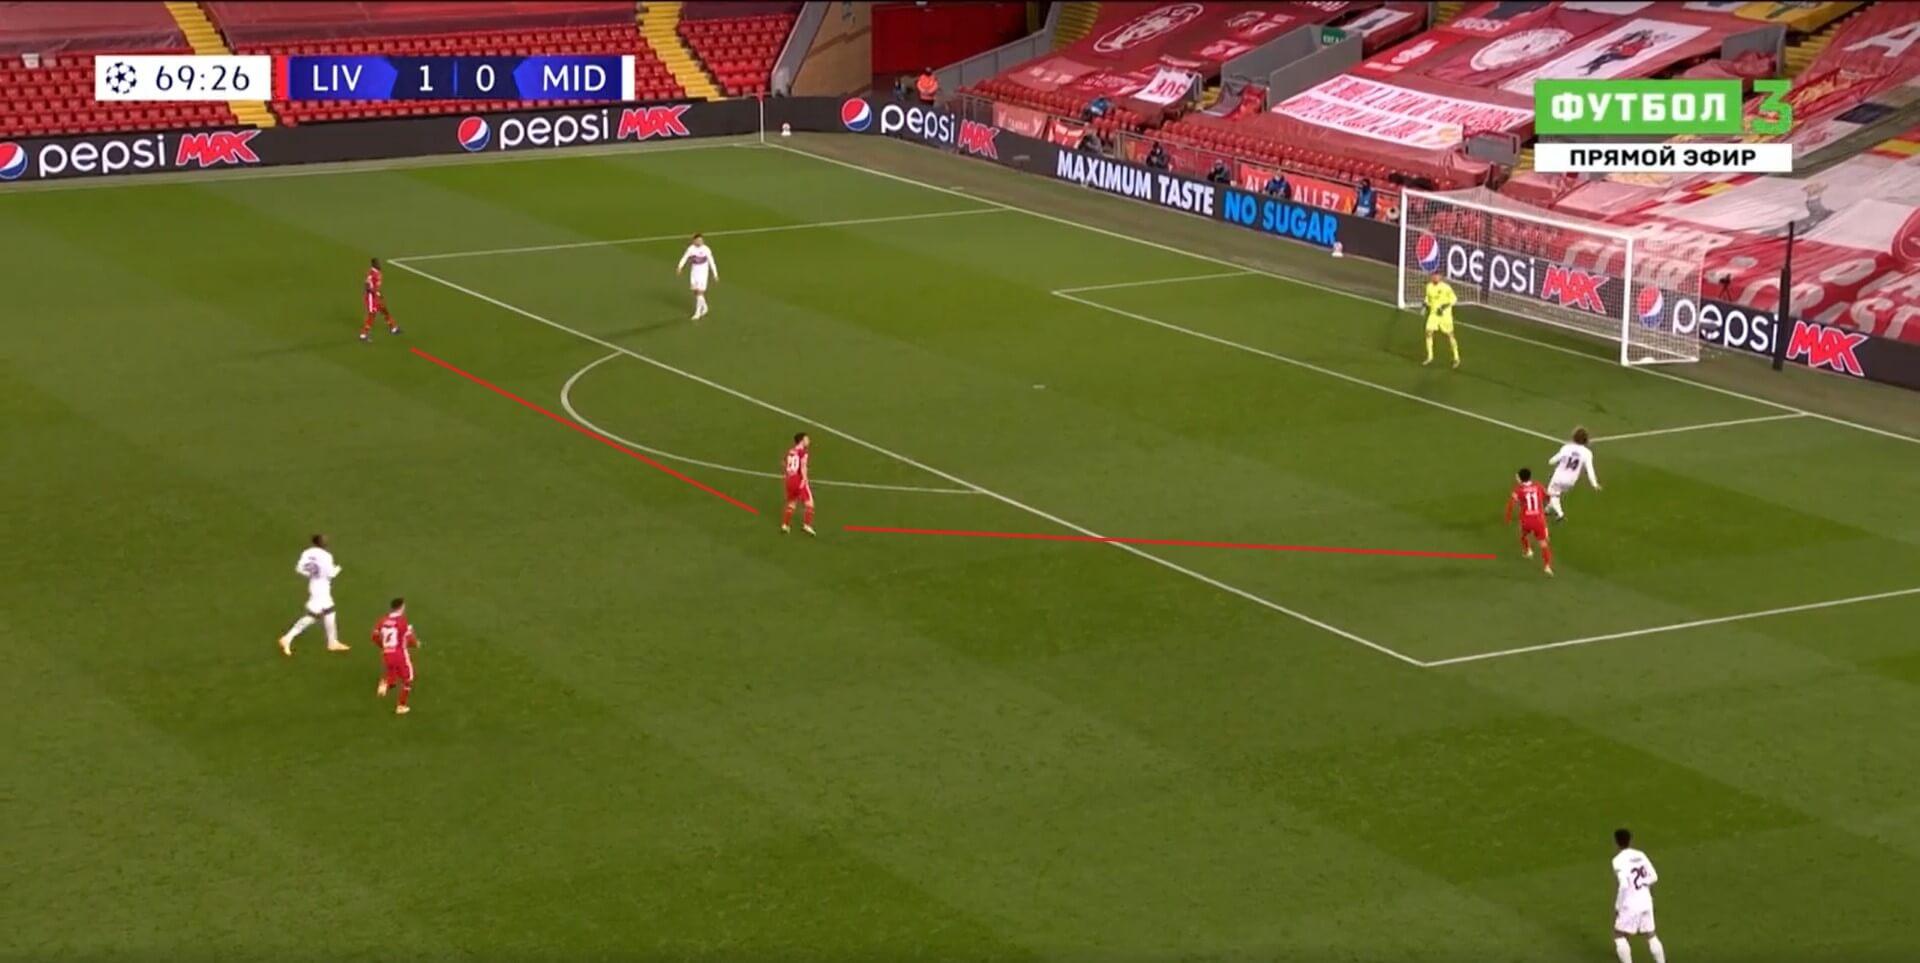 UEFA Champions League 2020/2021: Liverpool v Midtjylland - tactical analysis tactics